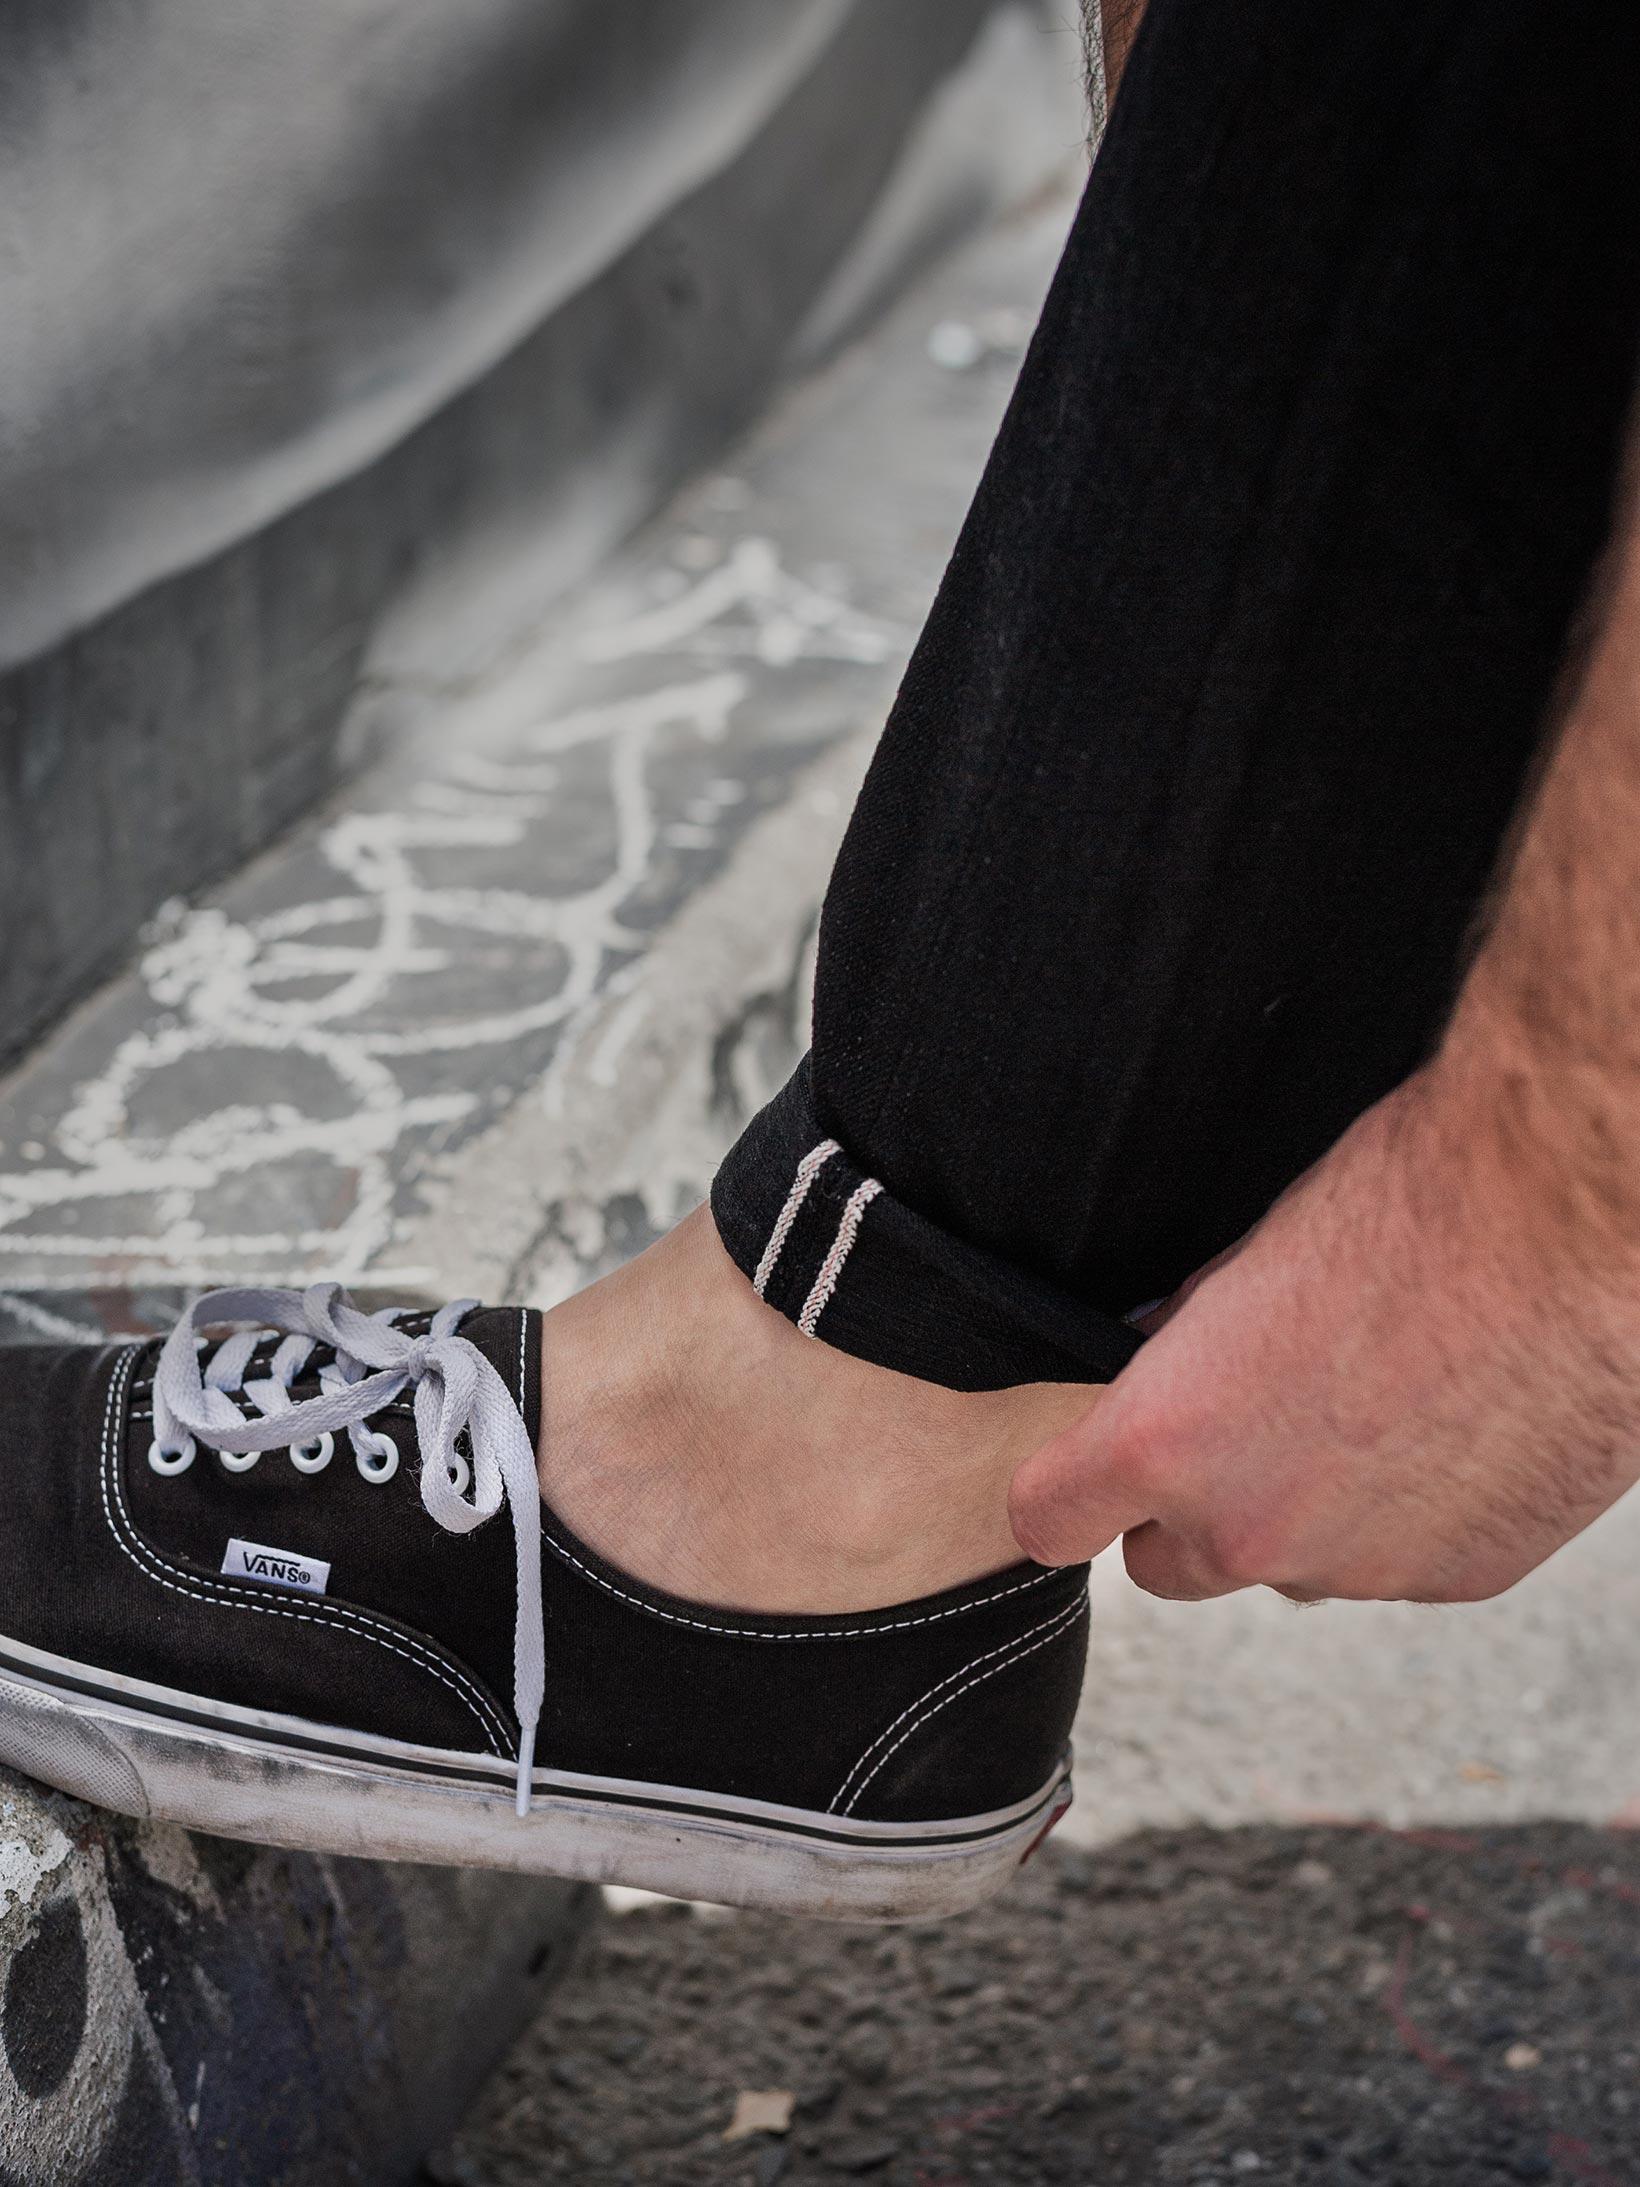 Studio D'Artisan SE-001 G3 Jeans - Straight Tapered Black - Image 22